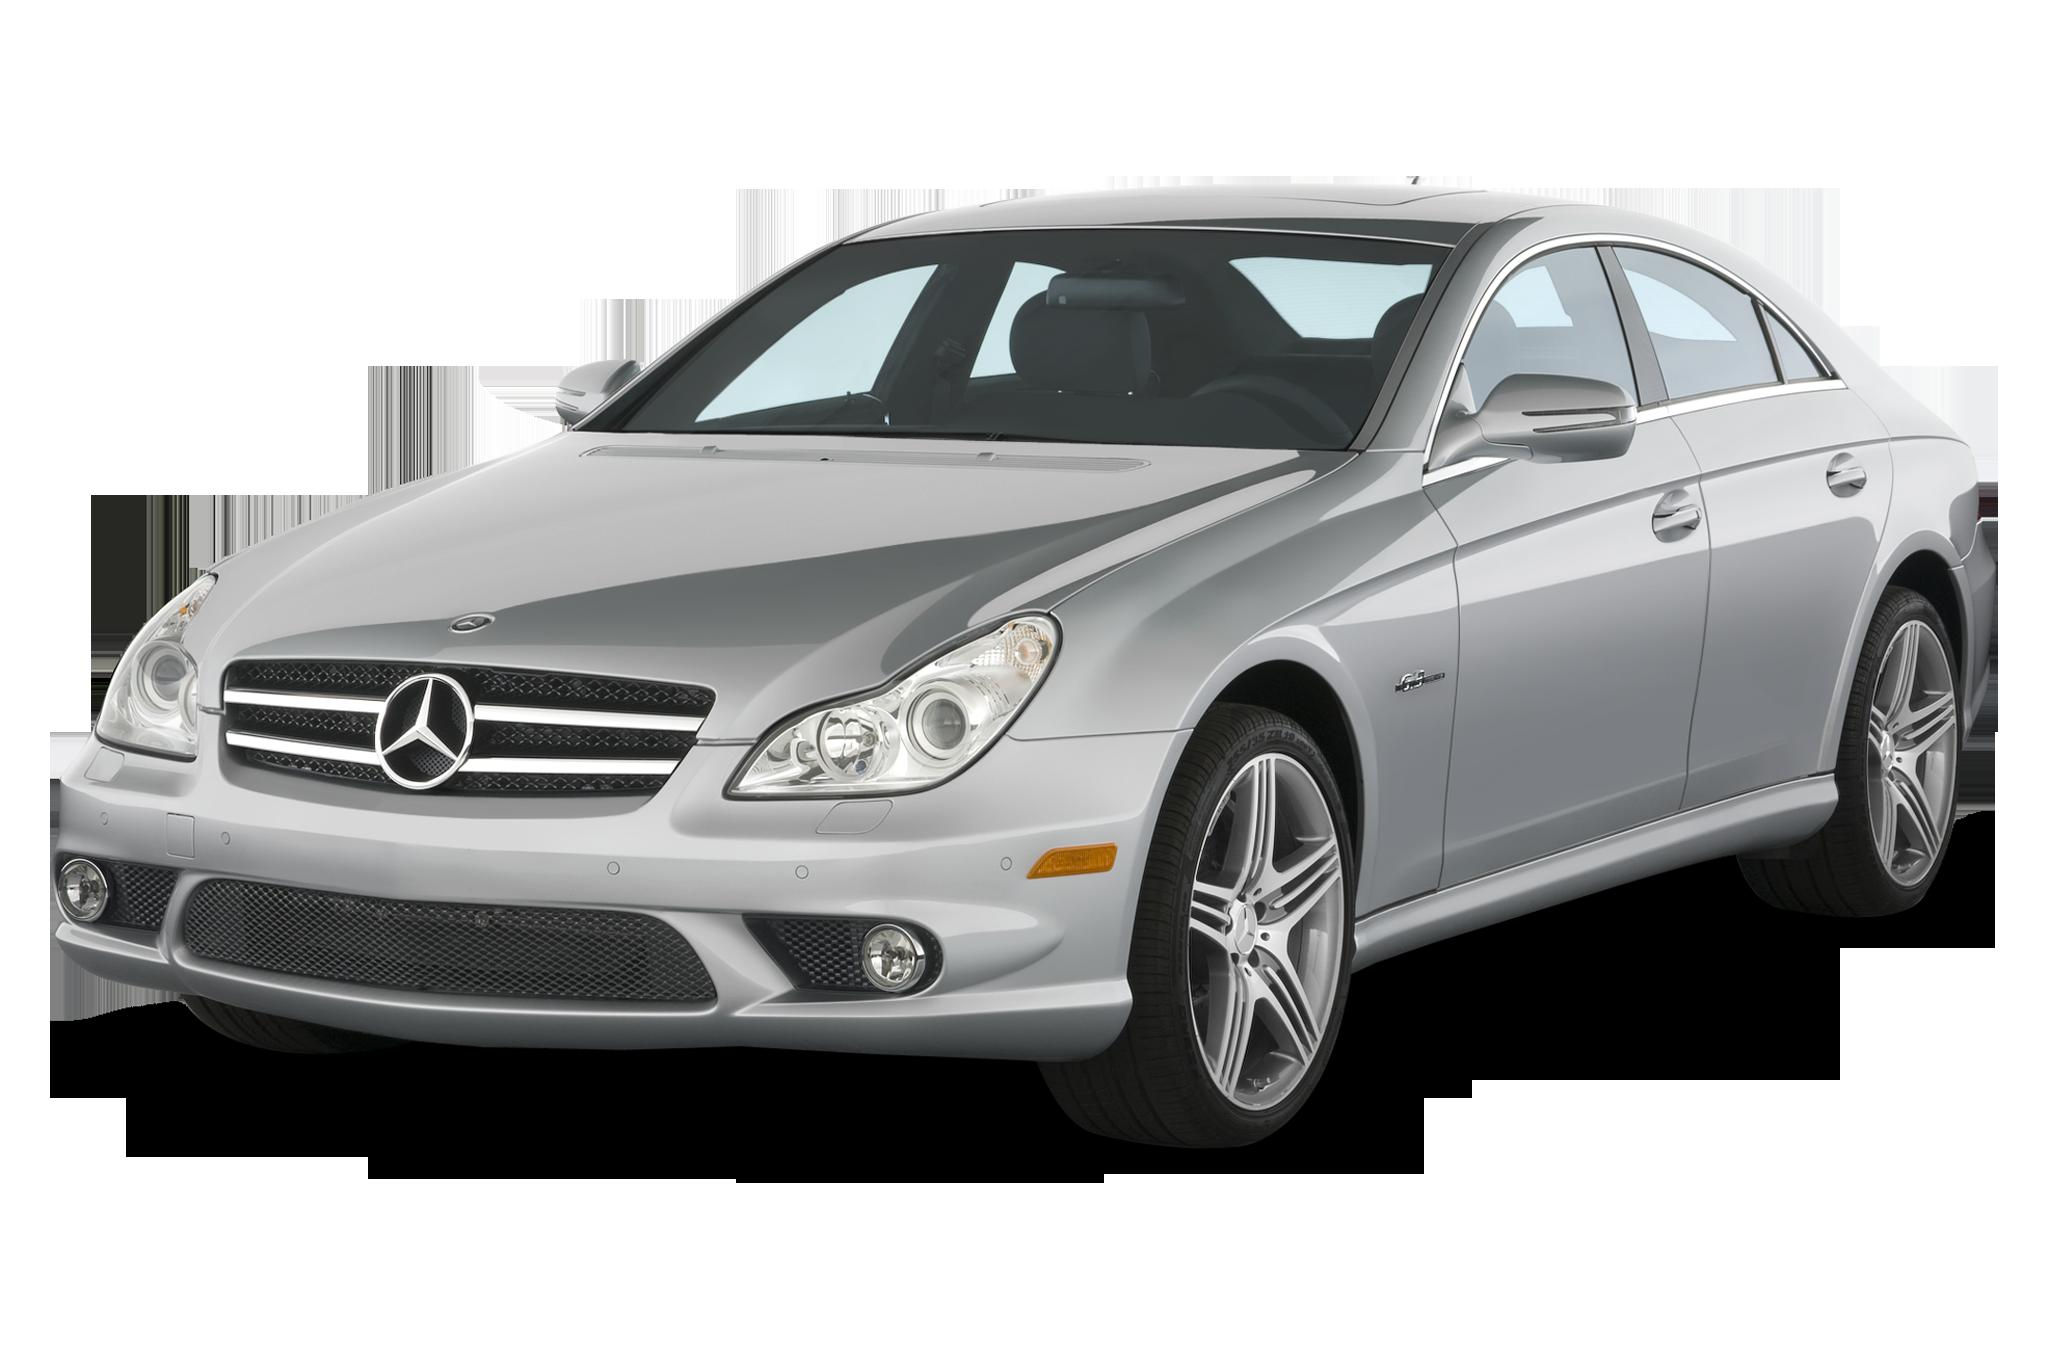 Mercedes benz price hike for 2012 slk350 roadster for Mercedes benz cls 300 coupe